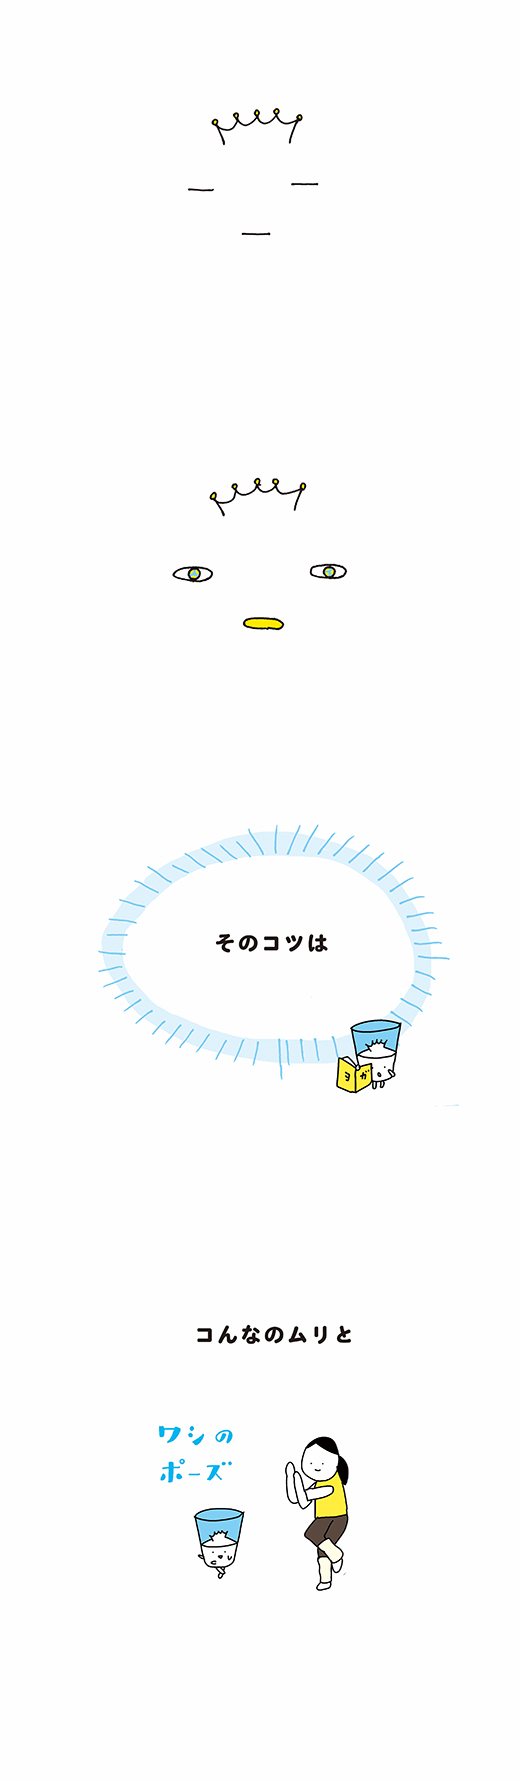 201104_kotaete_01